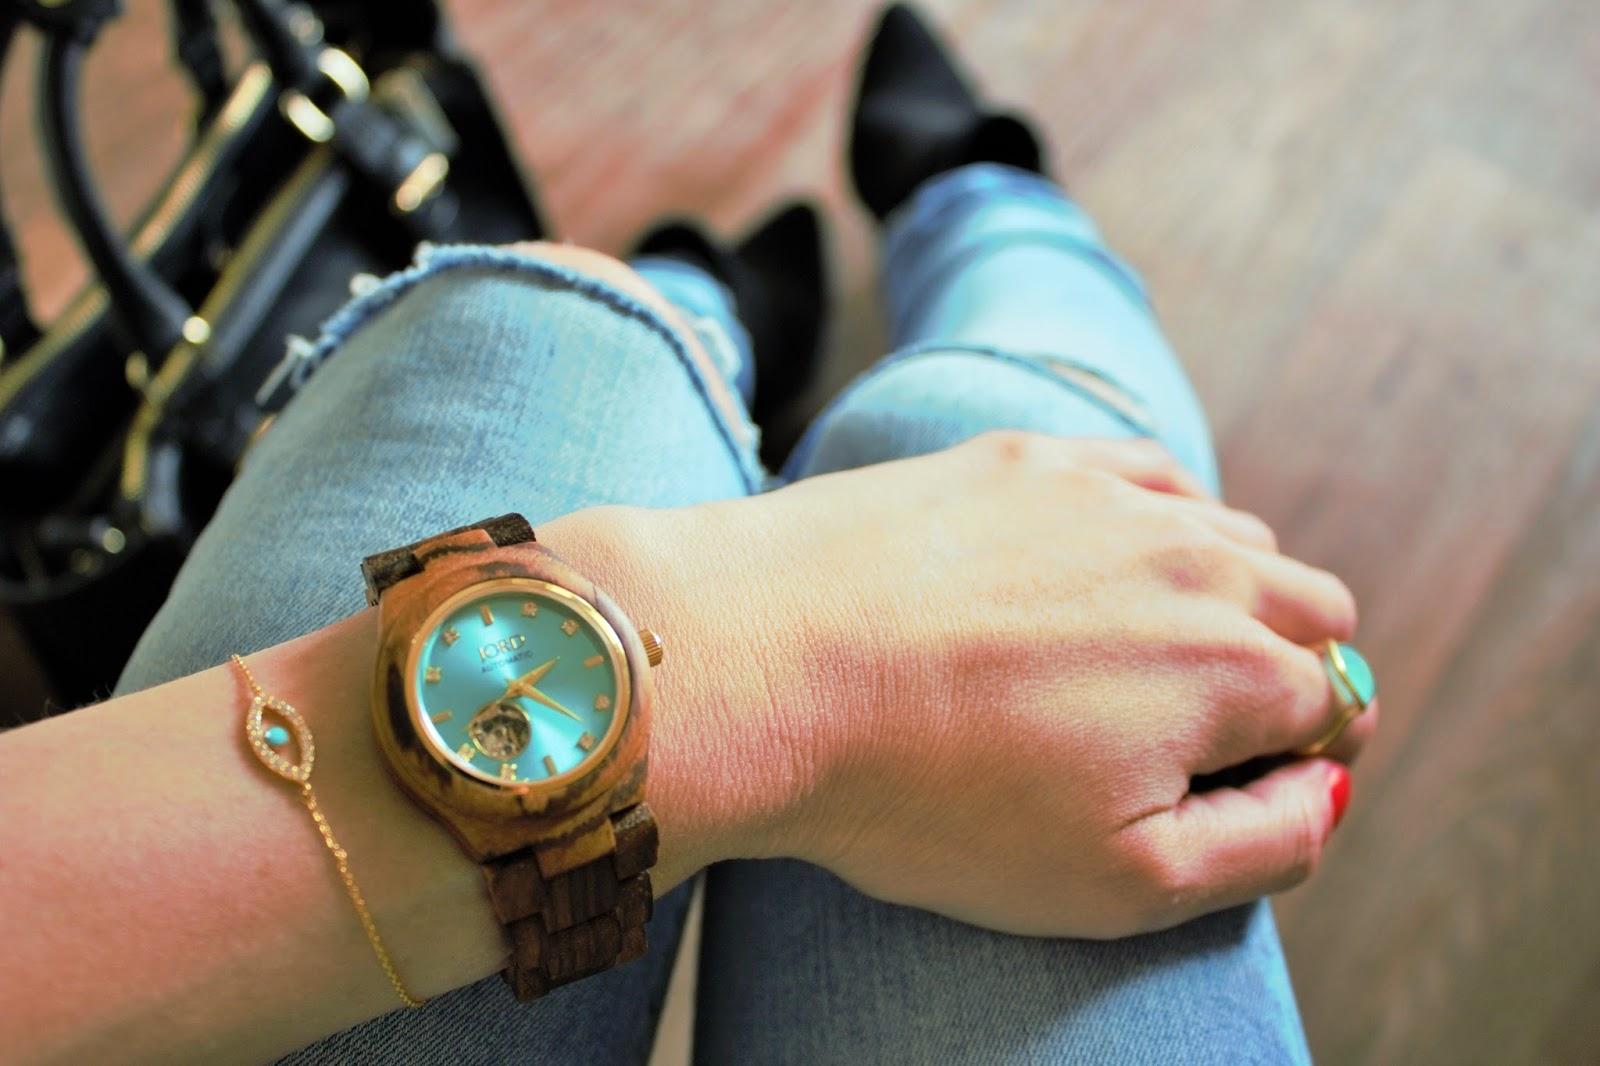 Jord Watch and Accessorize bracelet